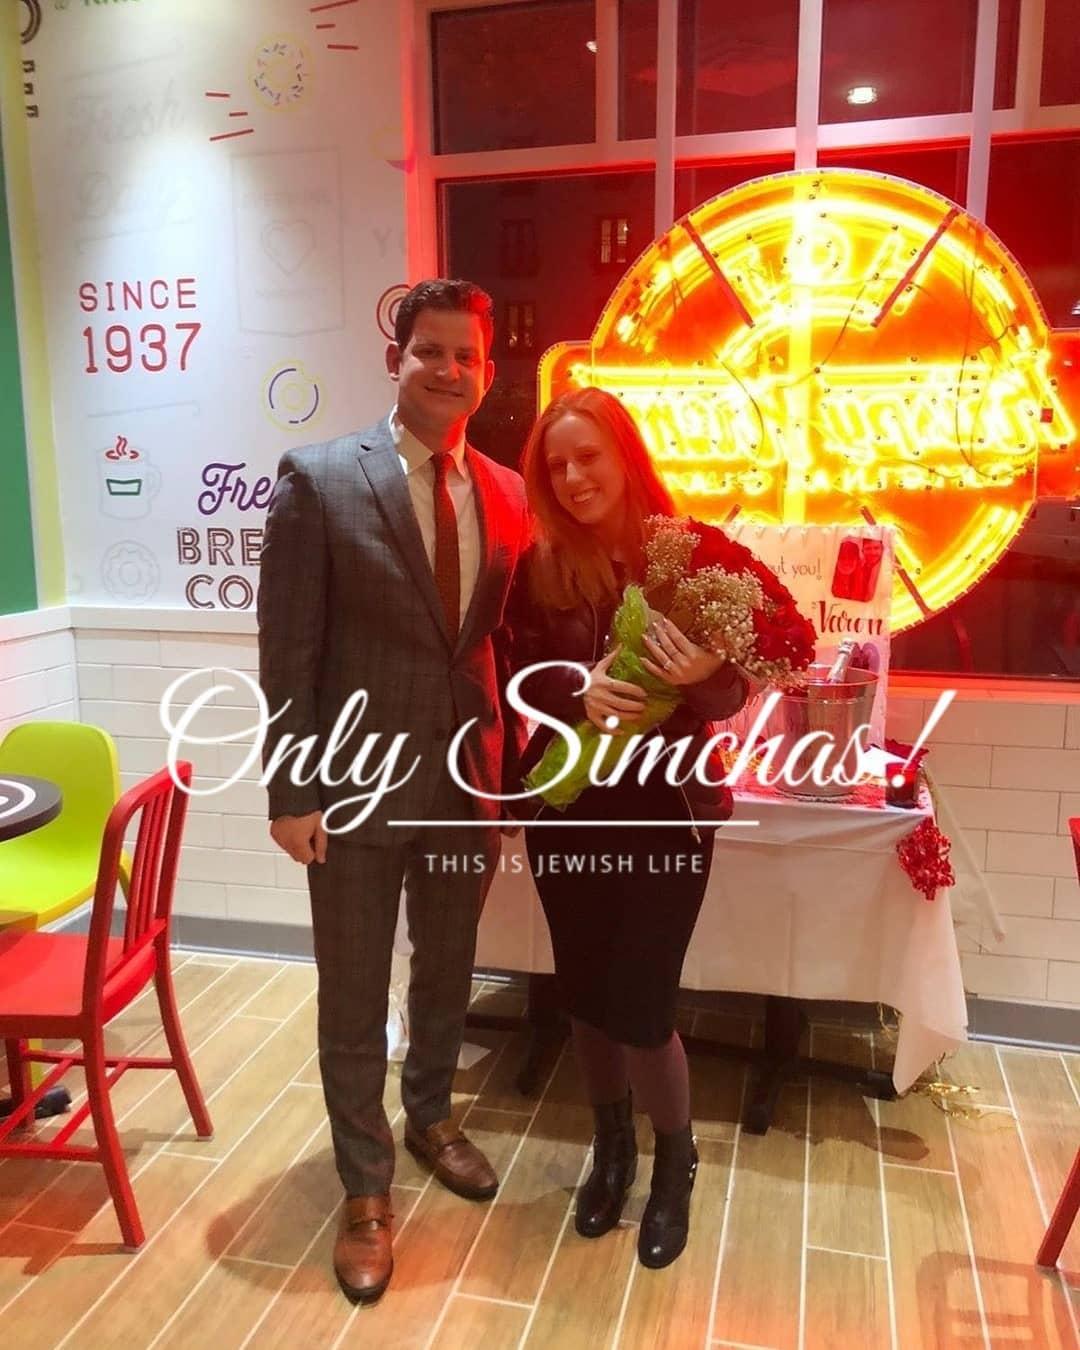 Engagement of Shoshana Varon (#Atlanta) and Ovadia Goldfeiz (#Baltimore)! #onlysimchas